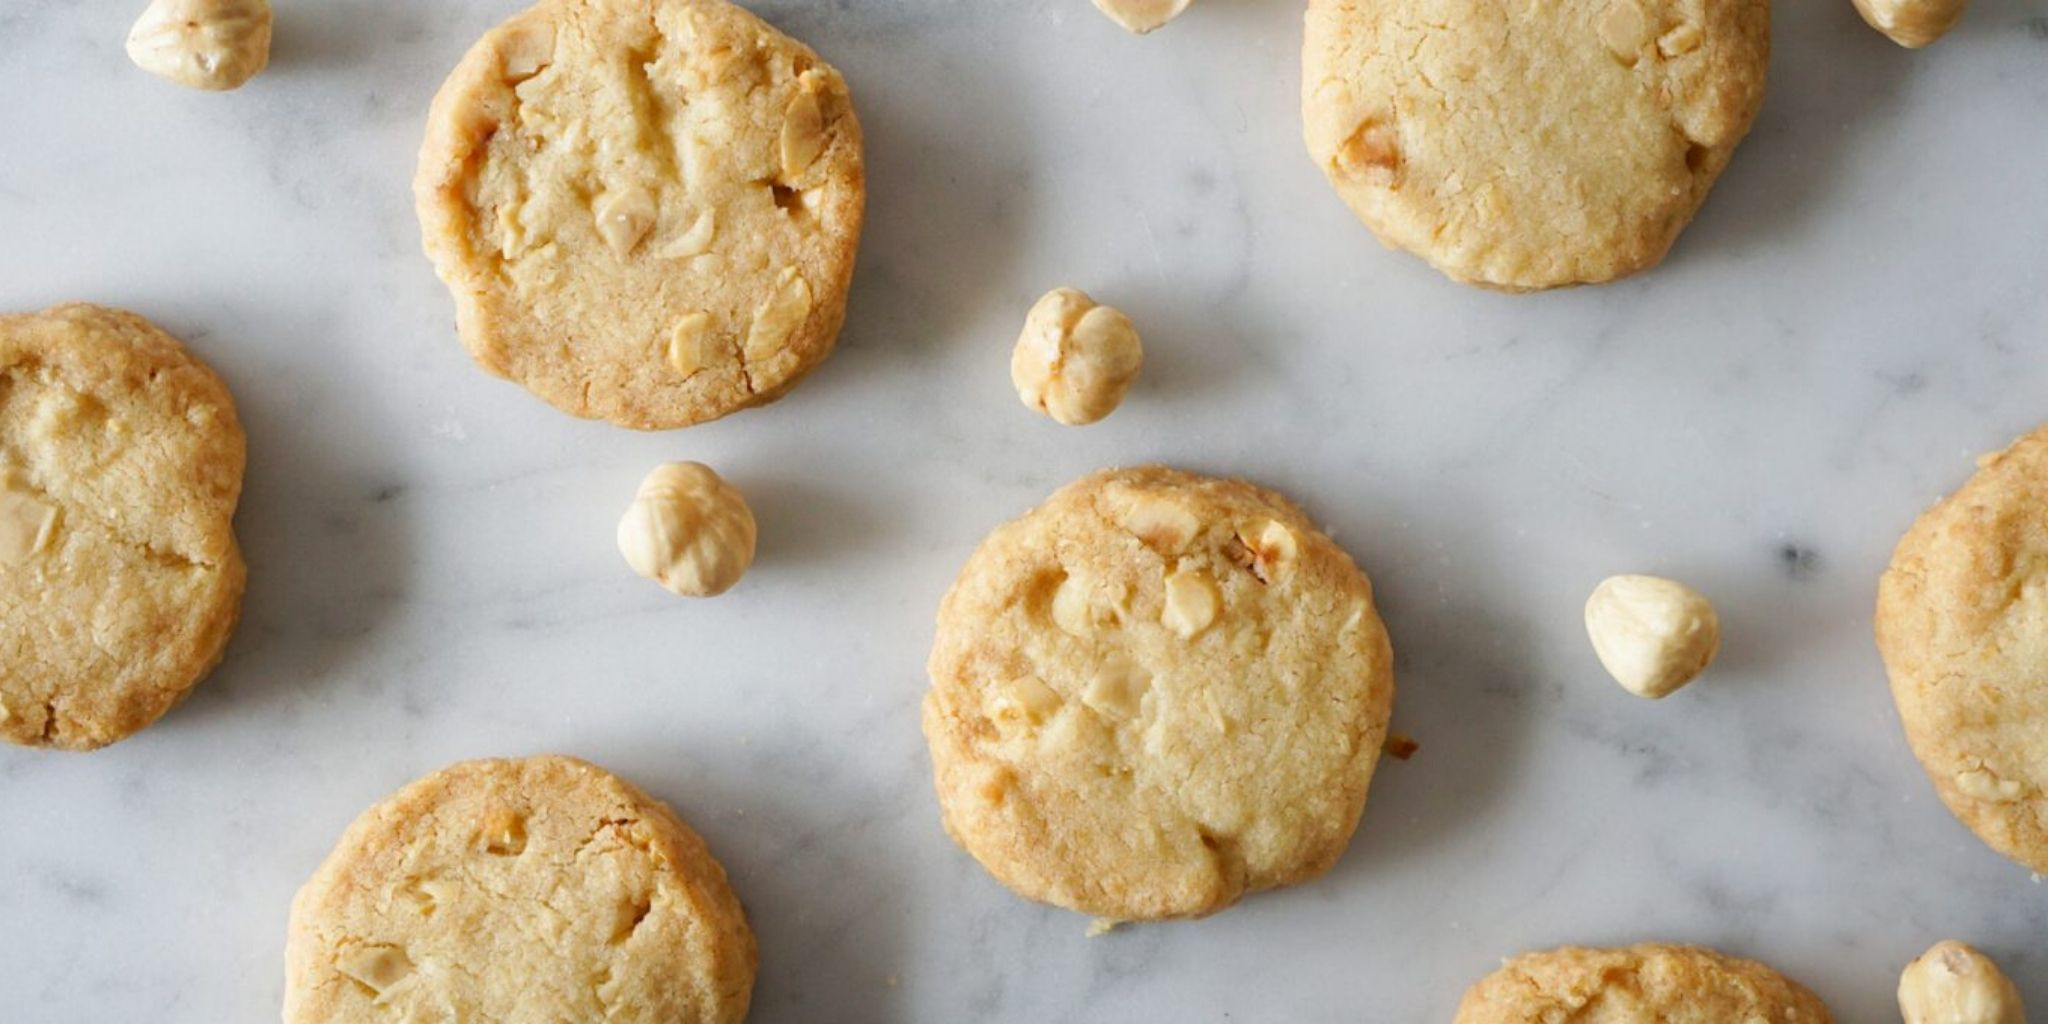 Recept på enkla kakor